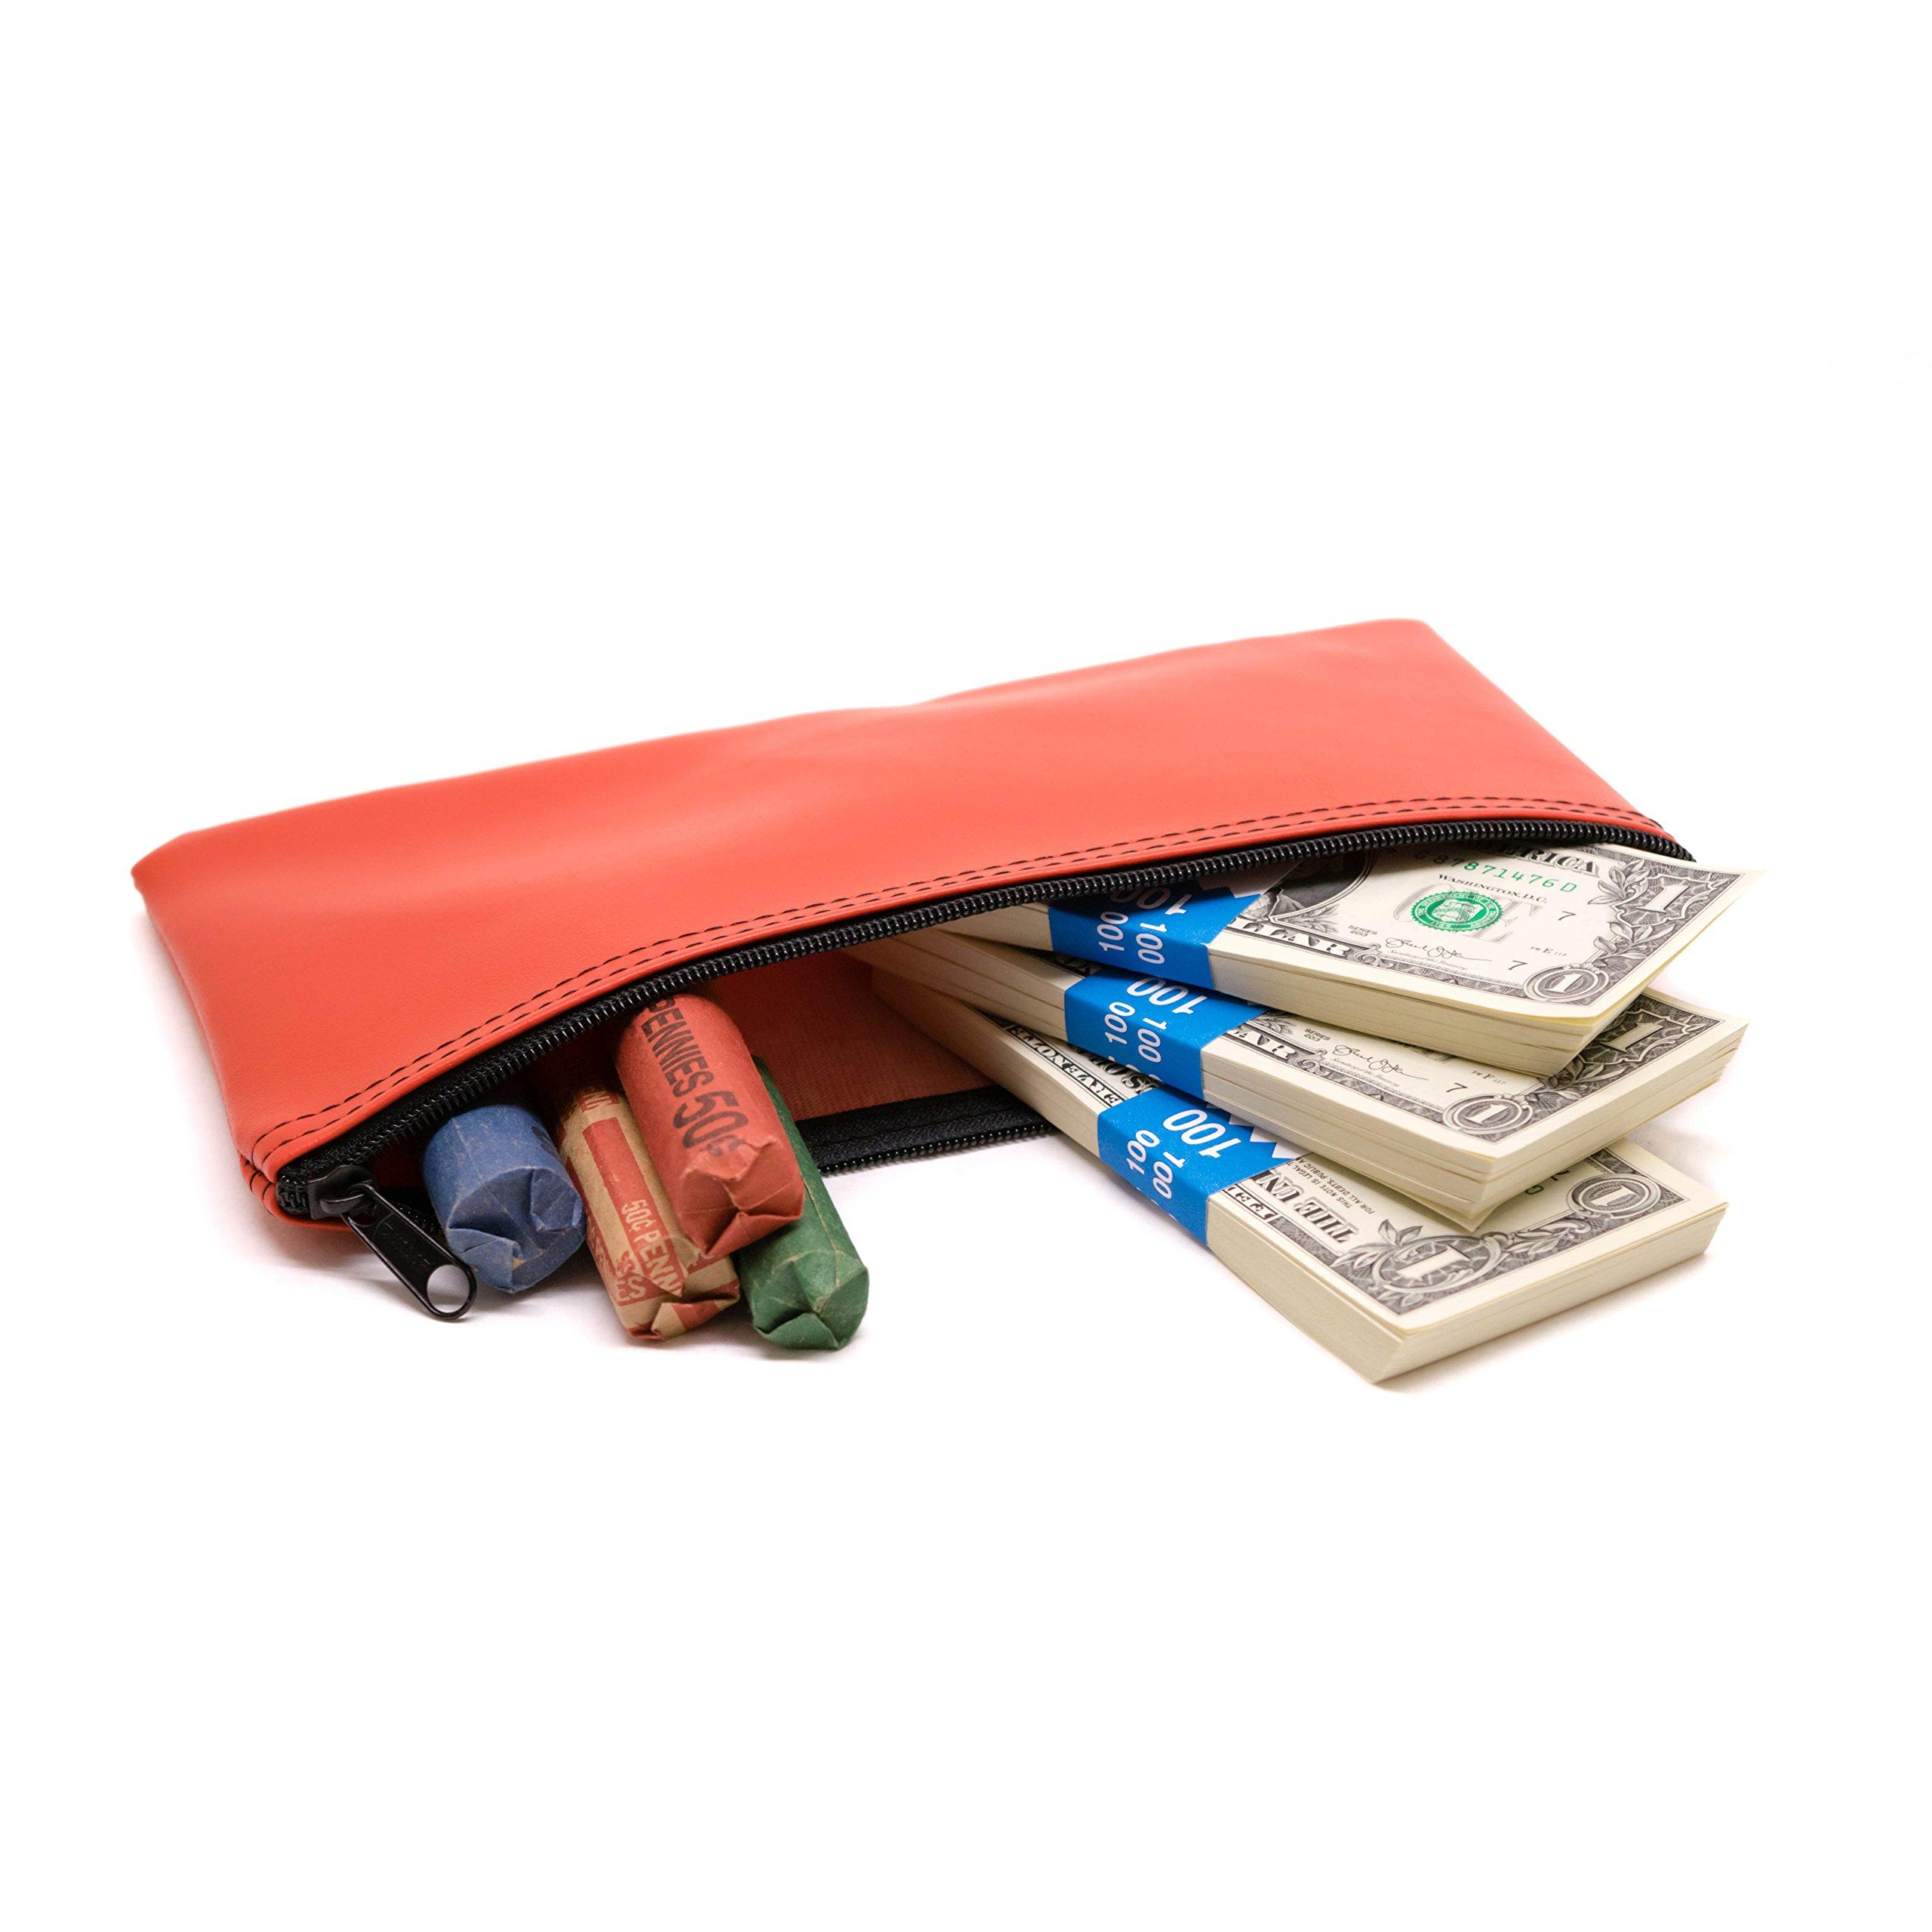 Zipper Bank Deposit Bag 5.5 X 10.5 Coin Check Money Wallet Red Pack of 10